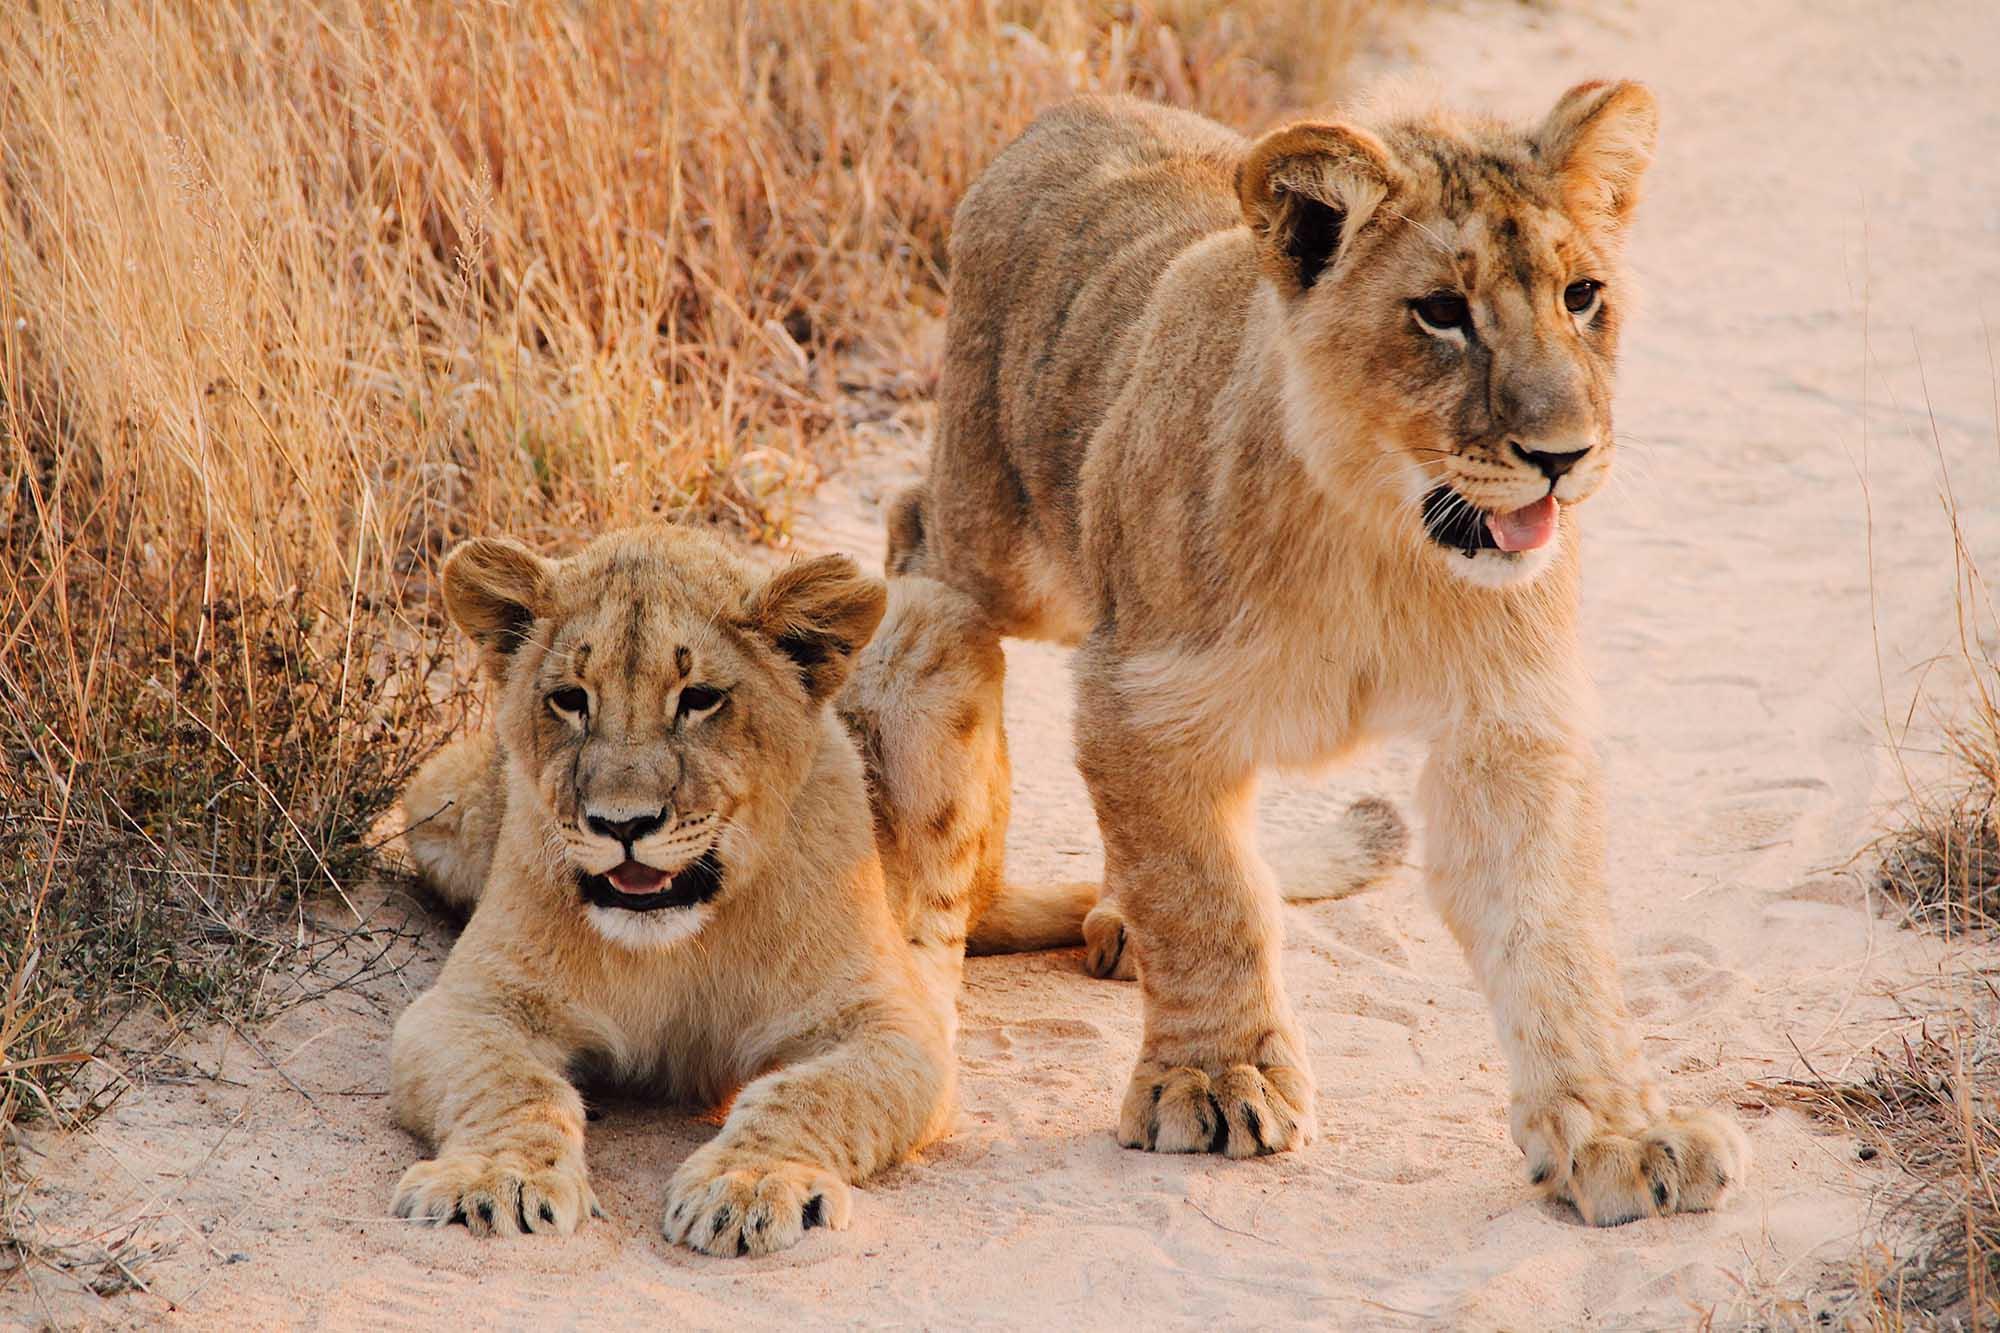 Petits lions lors d'un safari au Zimbabwe, Samsara Voyages